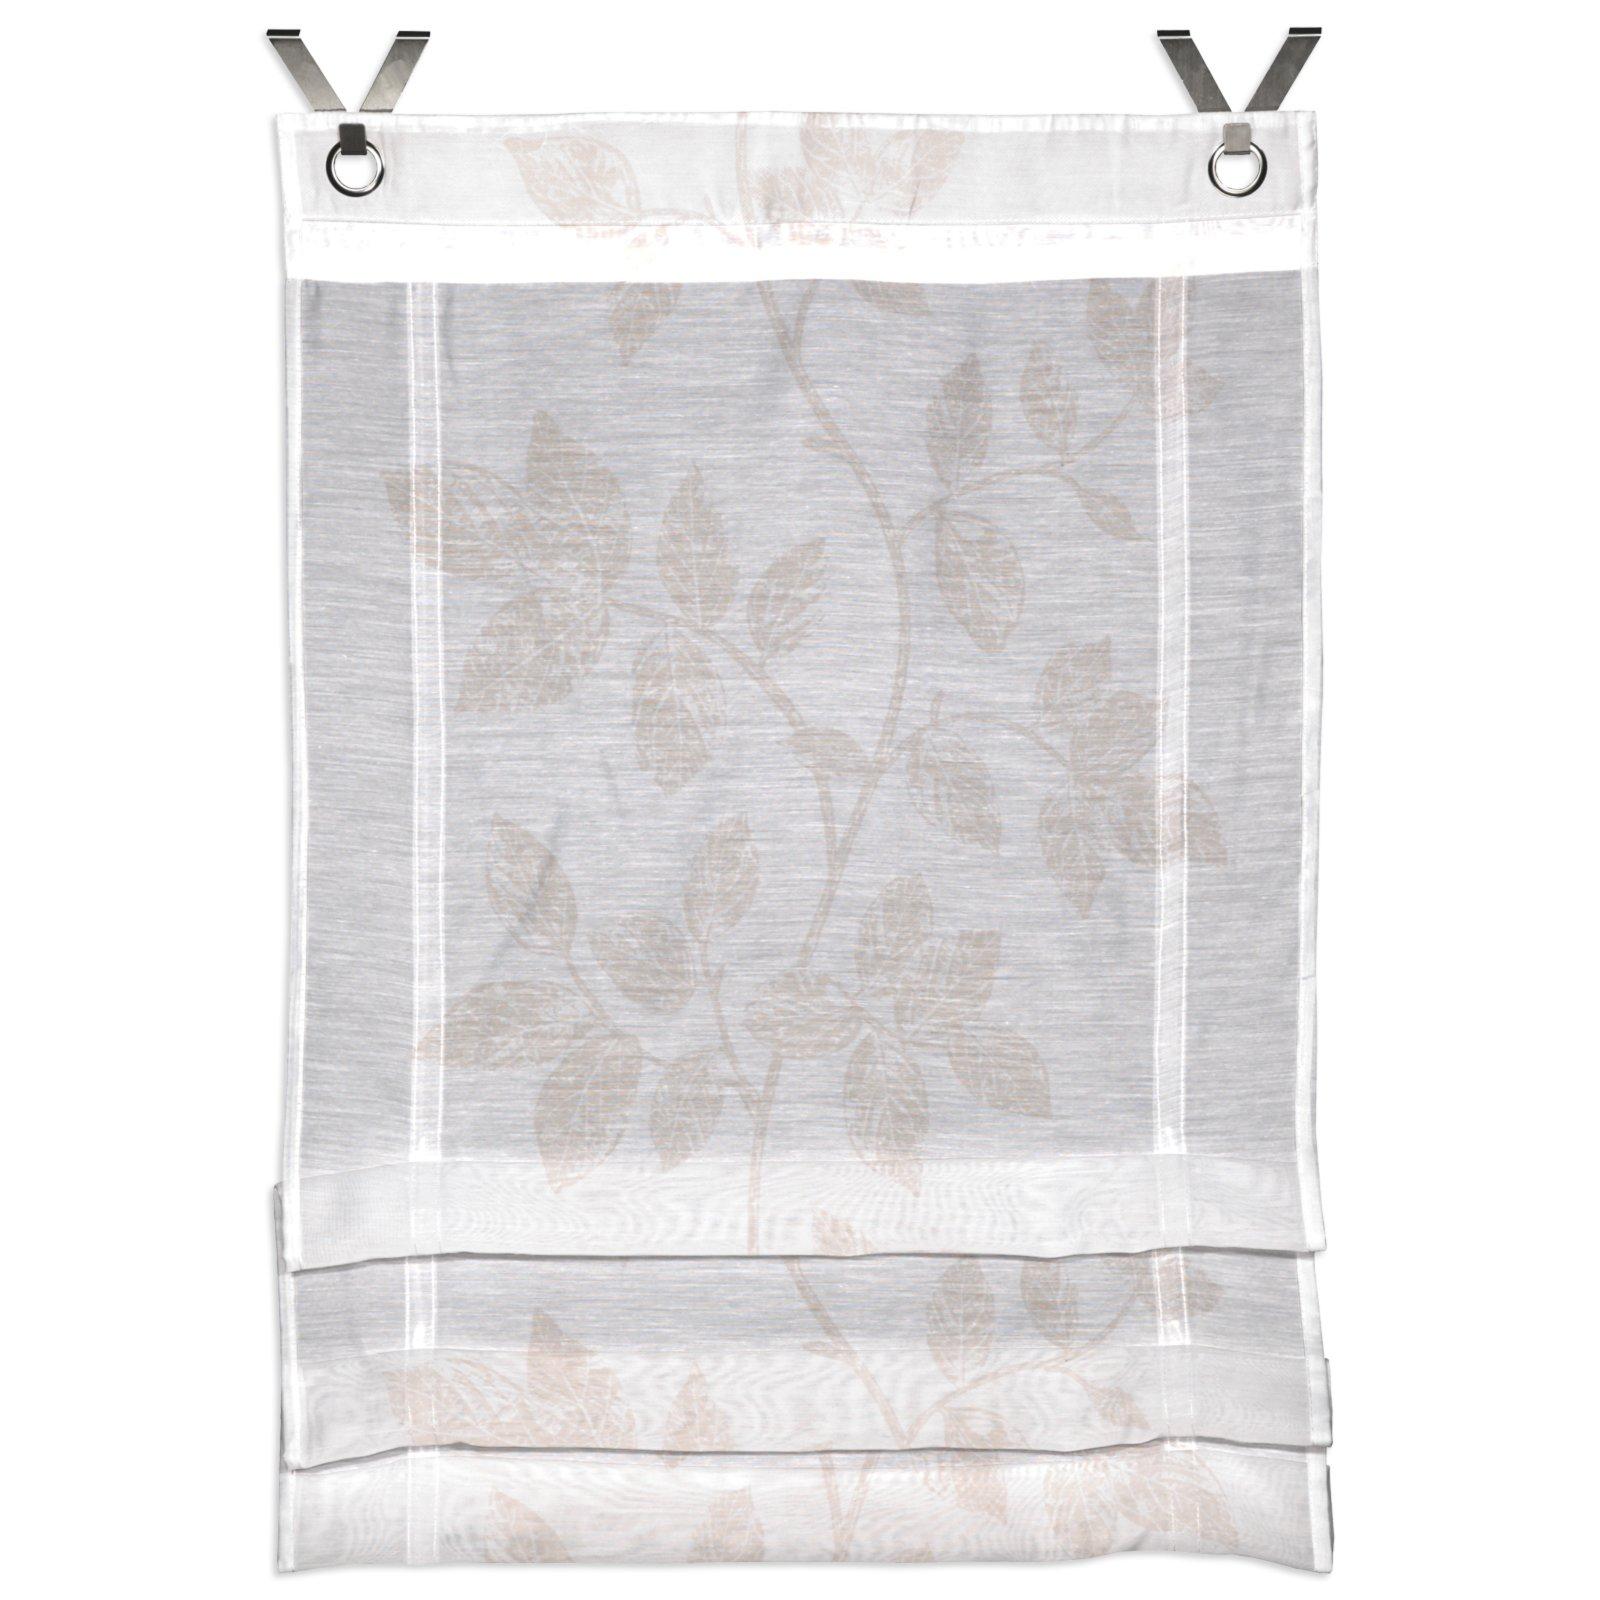 klipprollo alaska wei beige mit sen 60x120 cm transparente raffrollos raffrollos. Black Bedroom Furniture Sets. Home Design Ideas